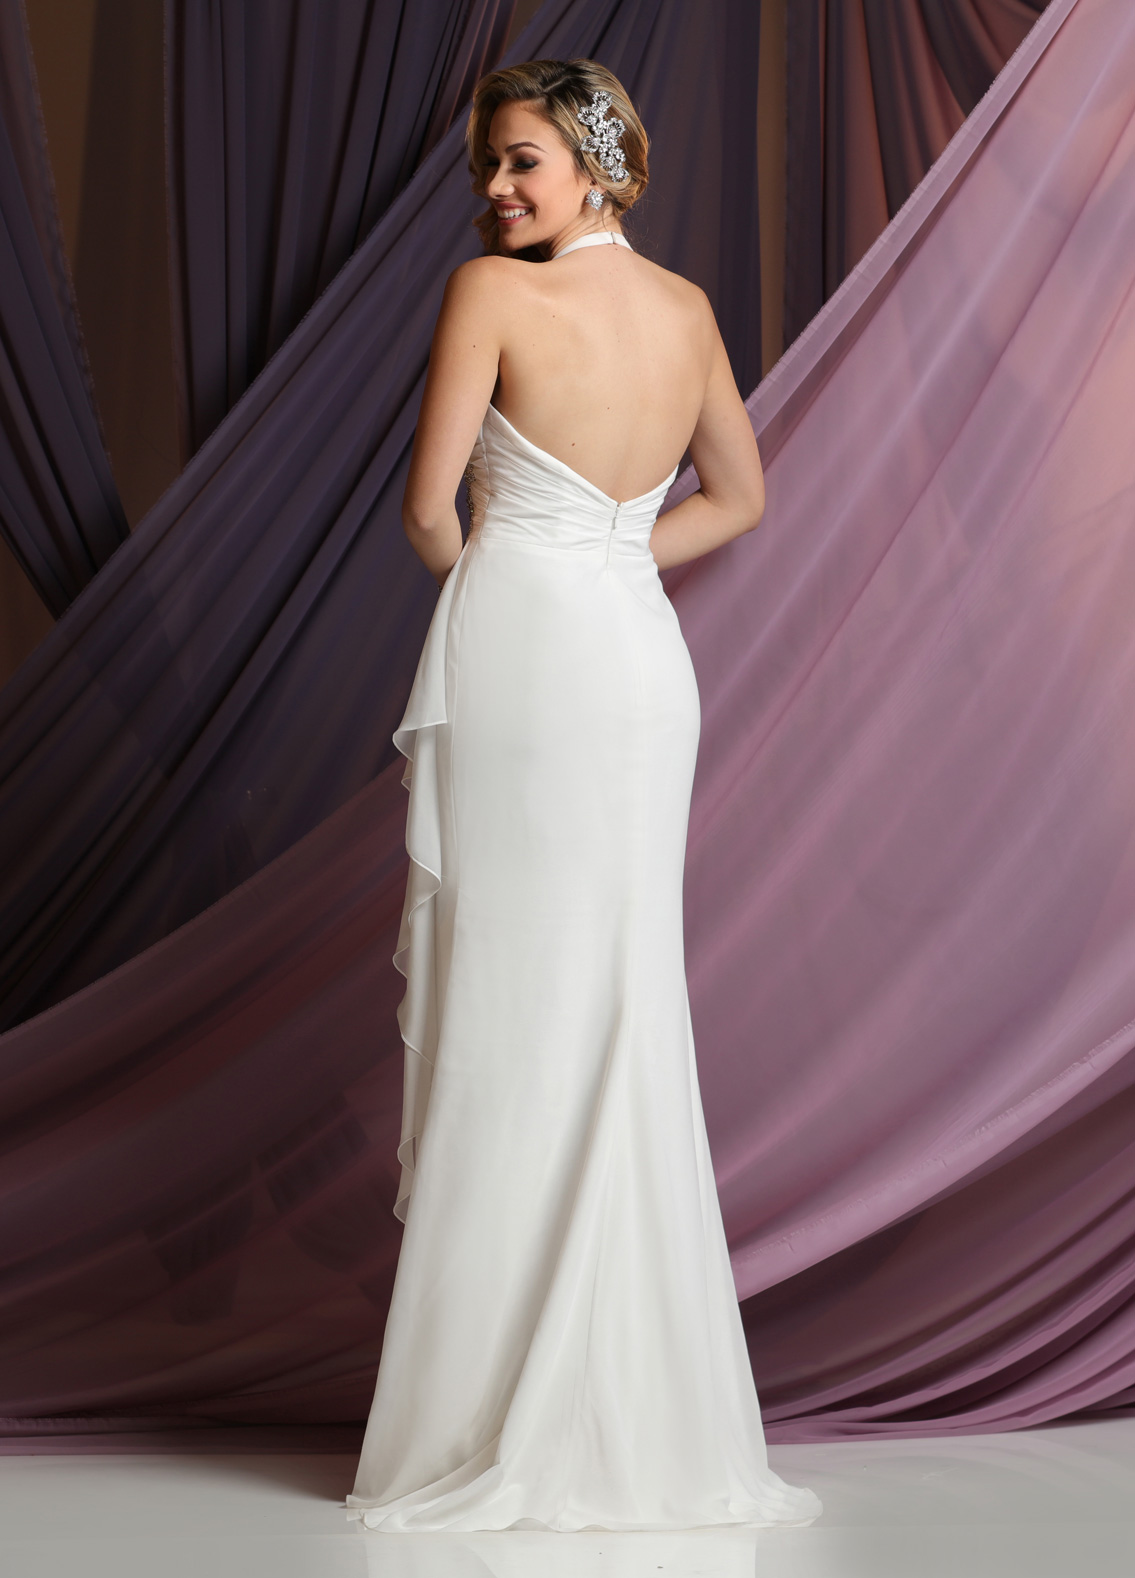 Halter & One Shoulder Informal Wedding Gown Collection - DaVinci ...